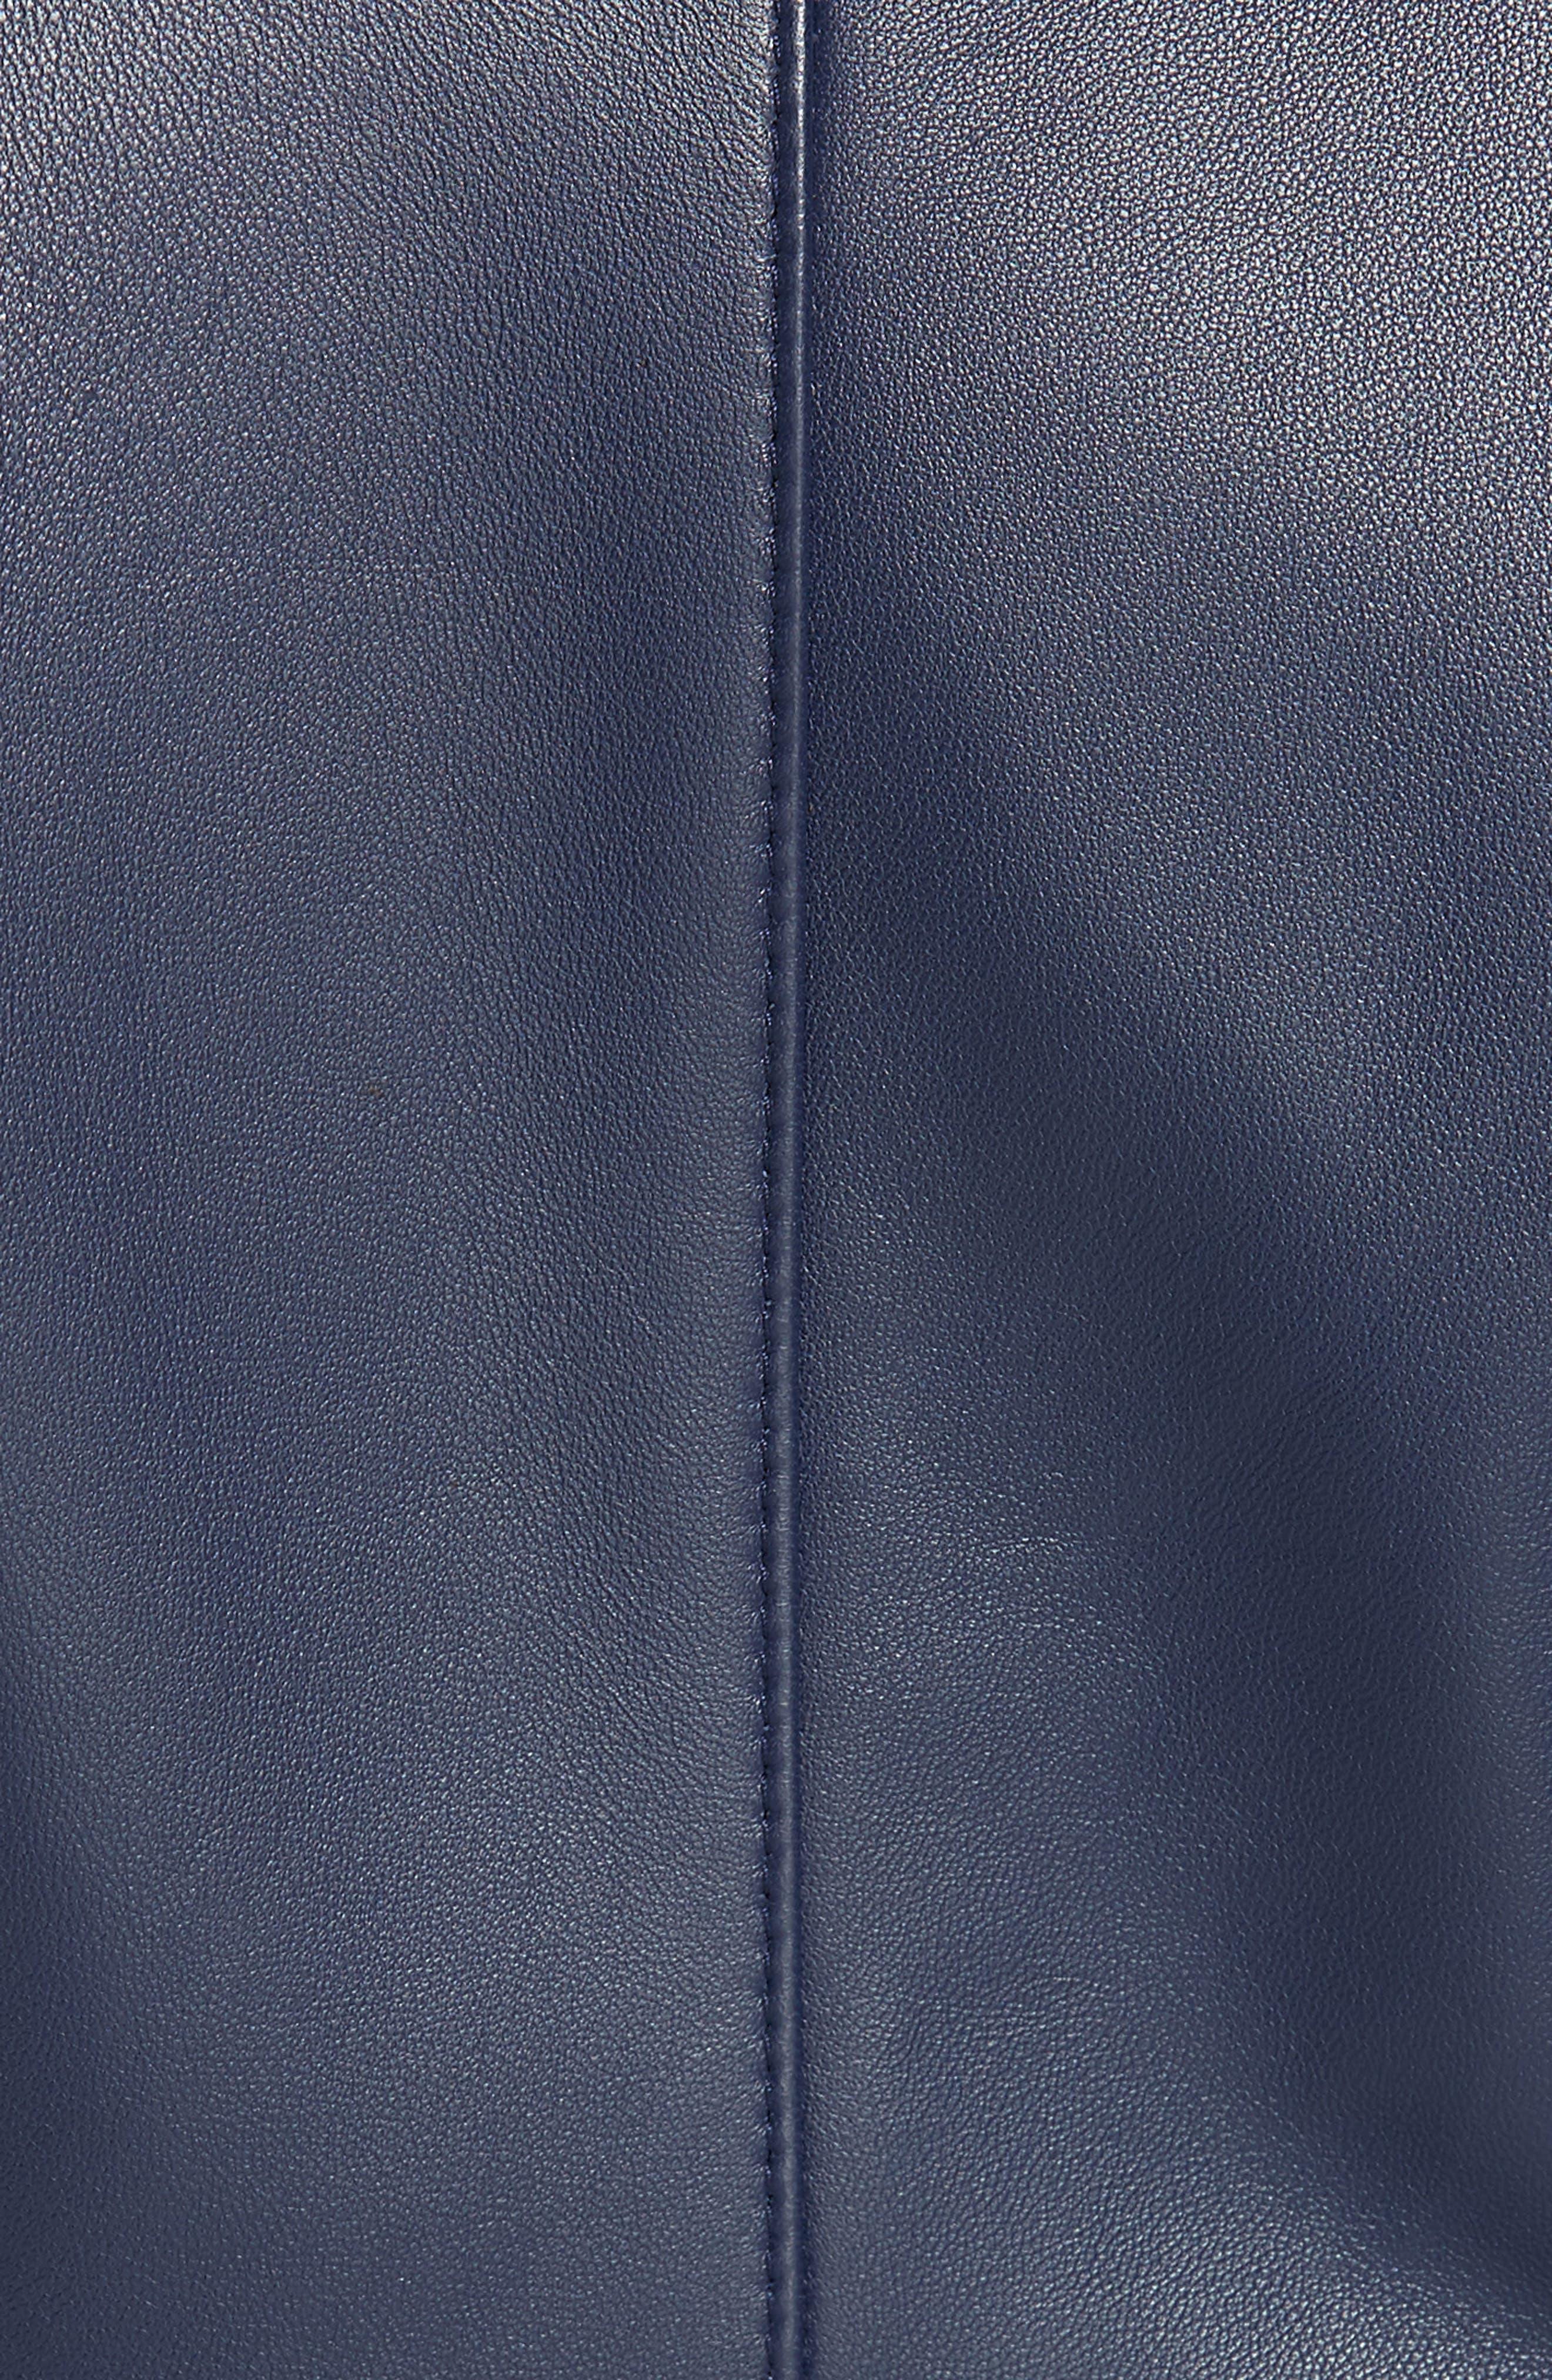 Sadeno Leather Moto Jacket,                             Alternate thumbnail 6, color,                             INK BLUE